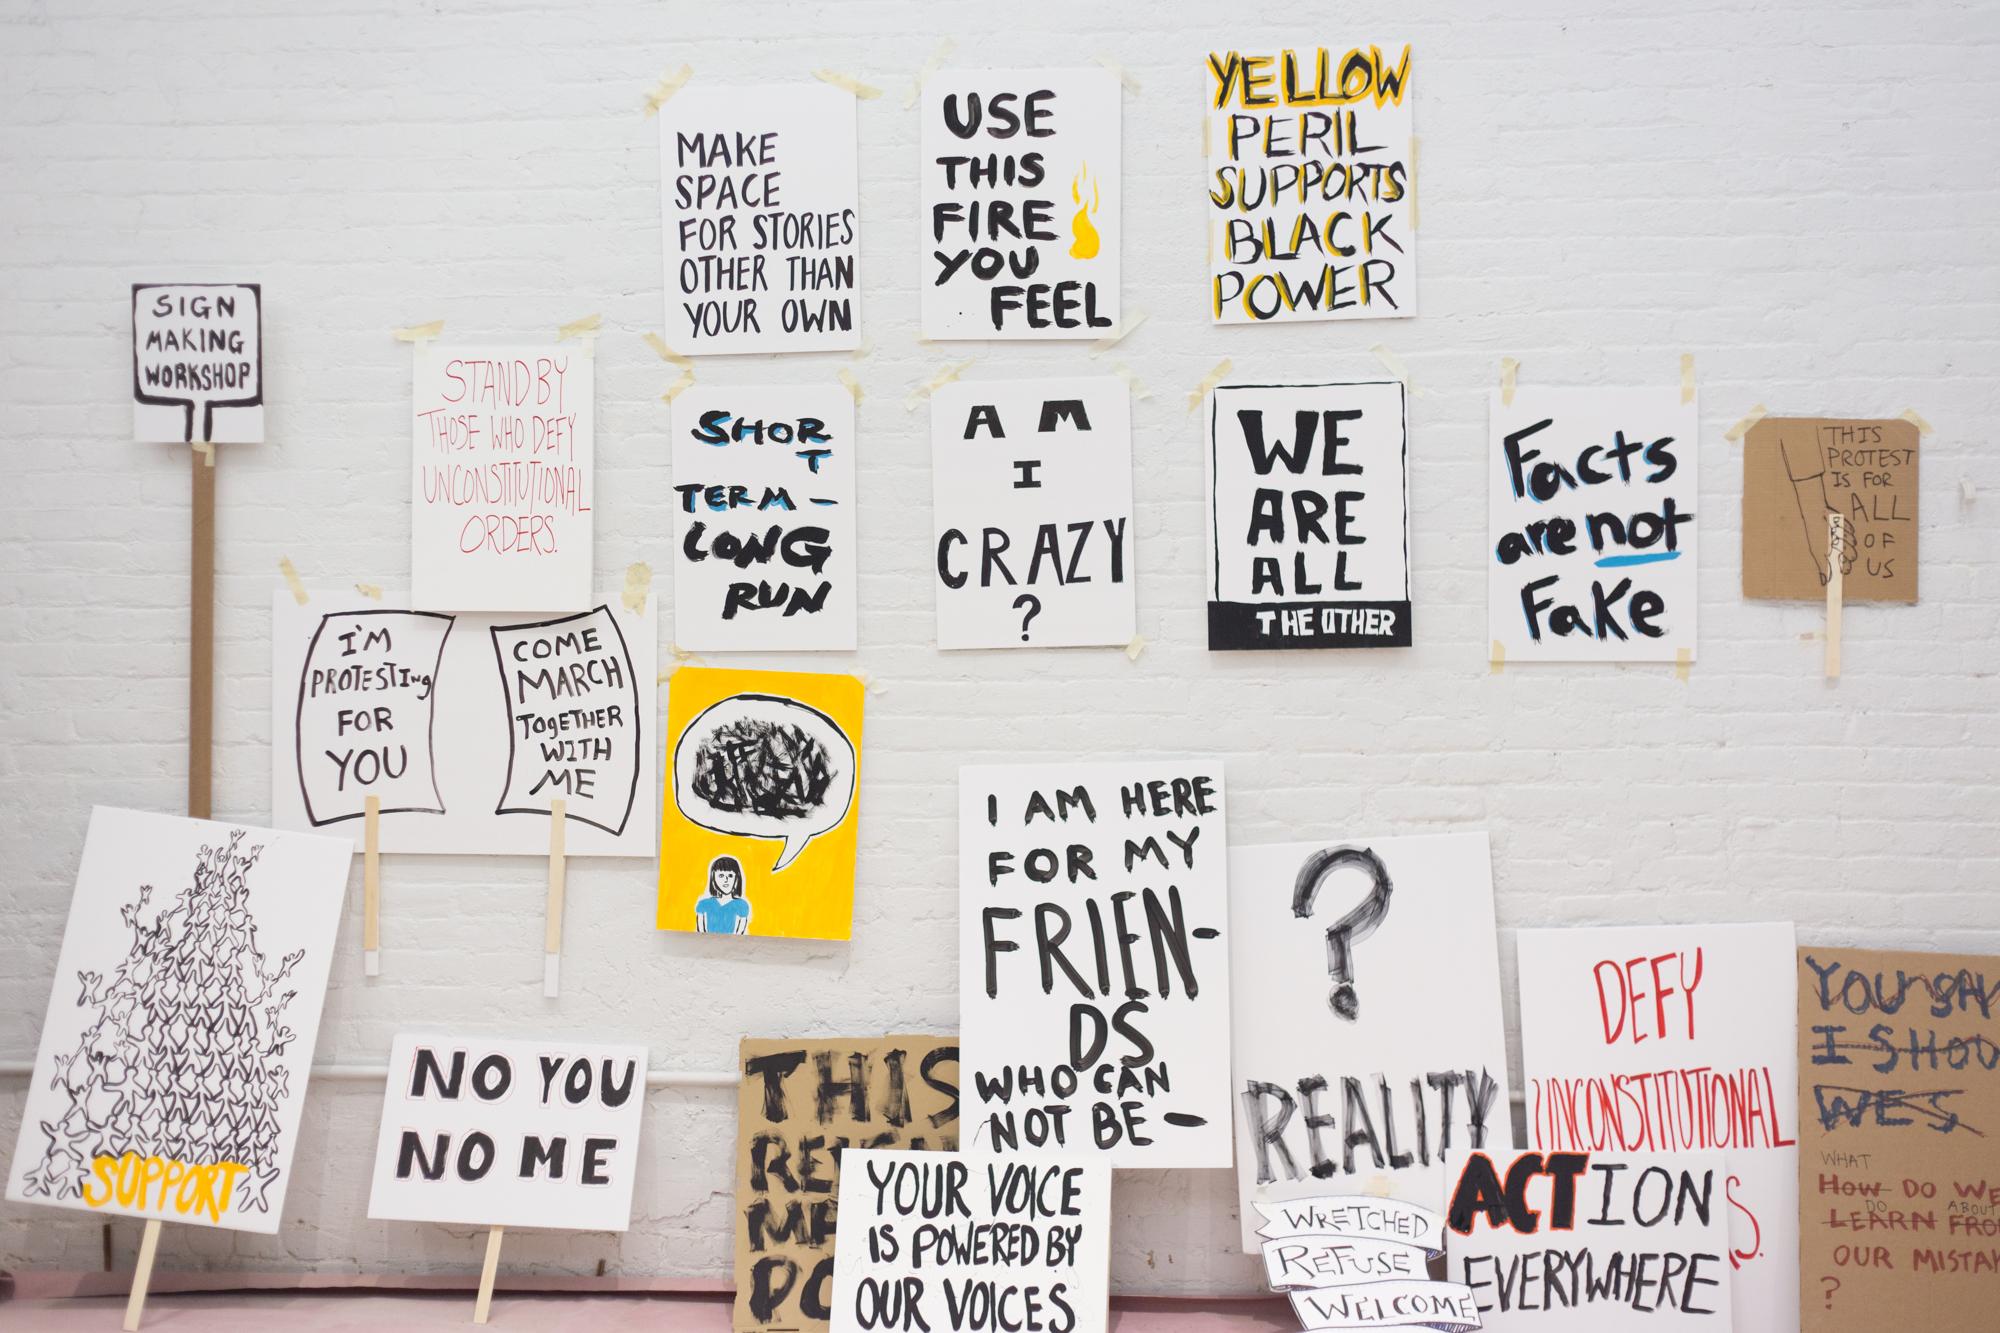 Sign Making Workshop NYC